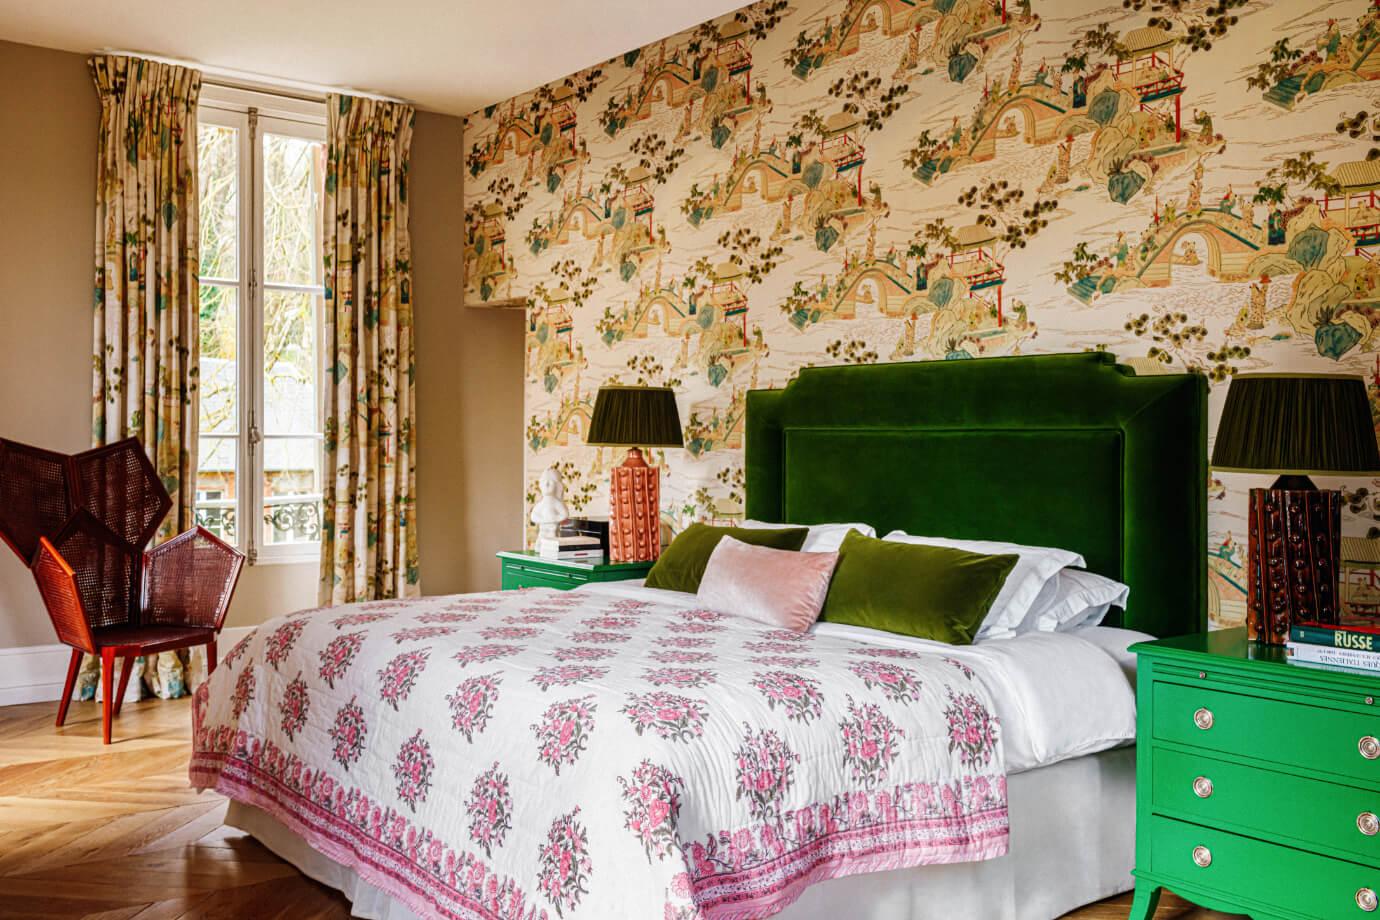 eclectic-bedroom-green-velvet-headboard-countryside-villa-france-nordroom